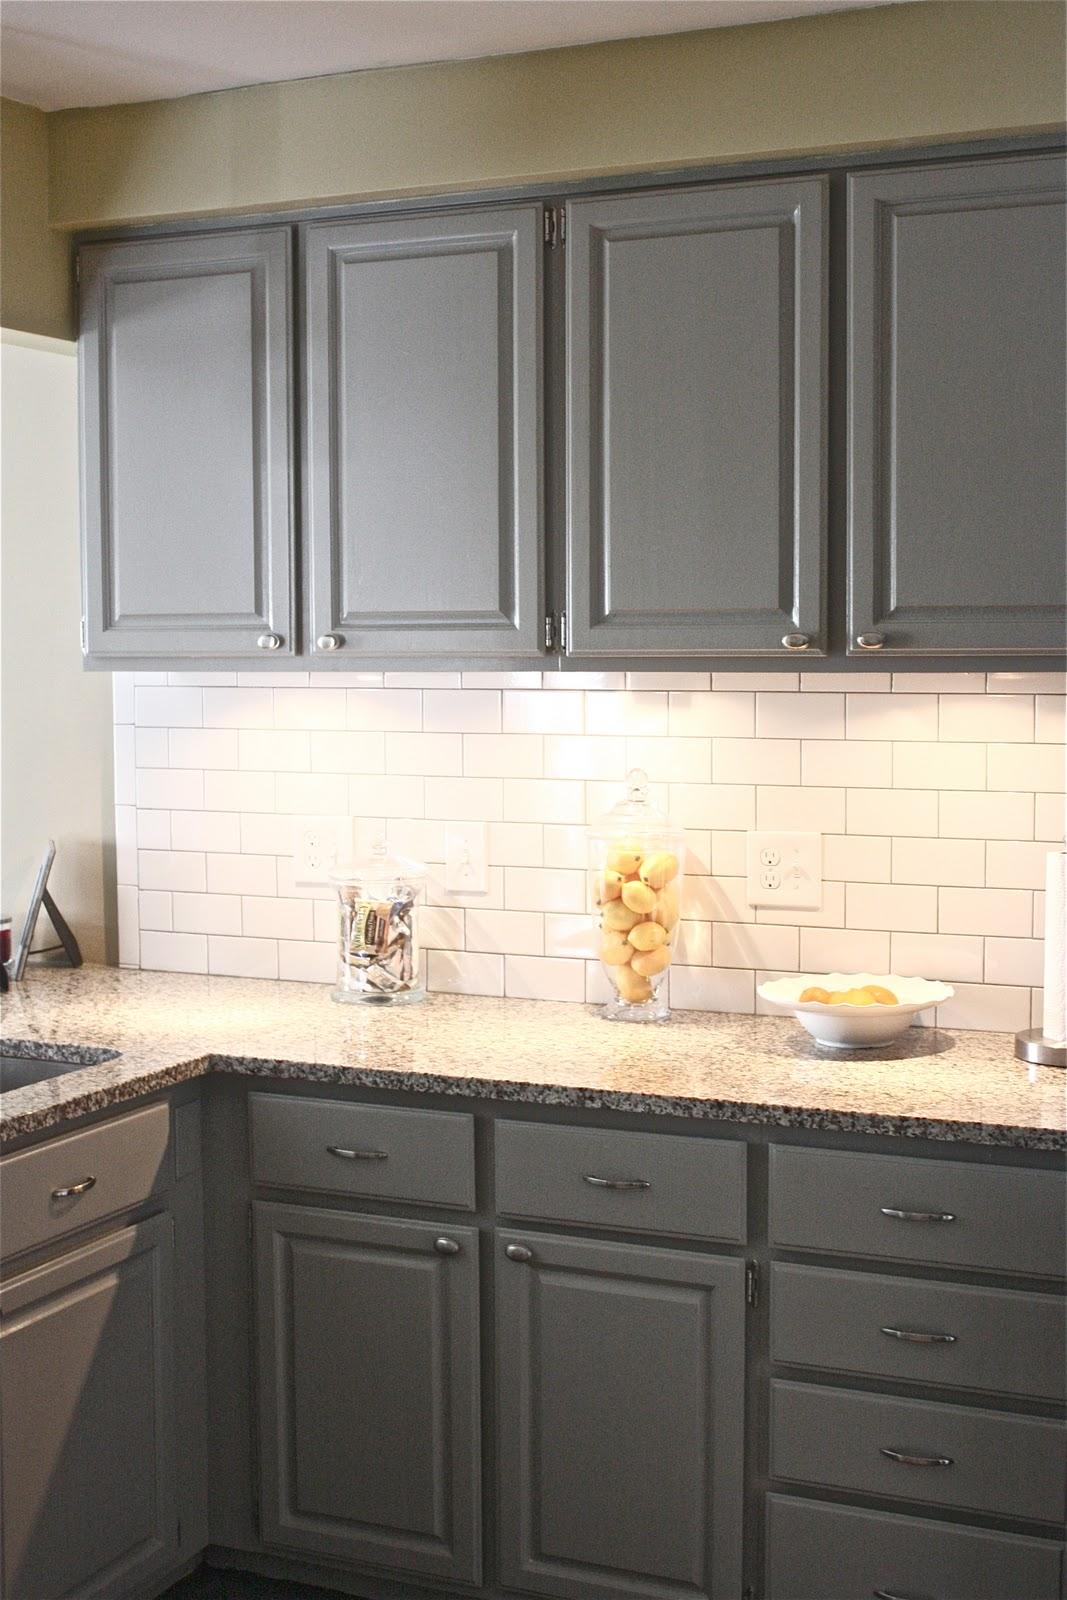 black kitchen cabinets and cream floor tiles best home decoration world class. Black Bedroom Furniture Sets. Home Design Ideas